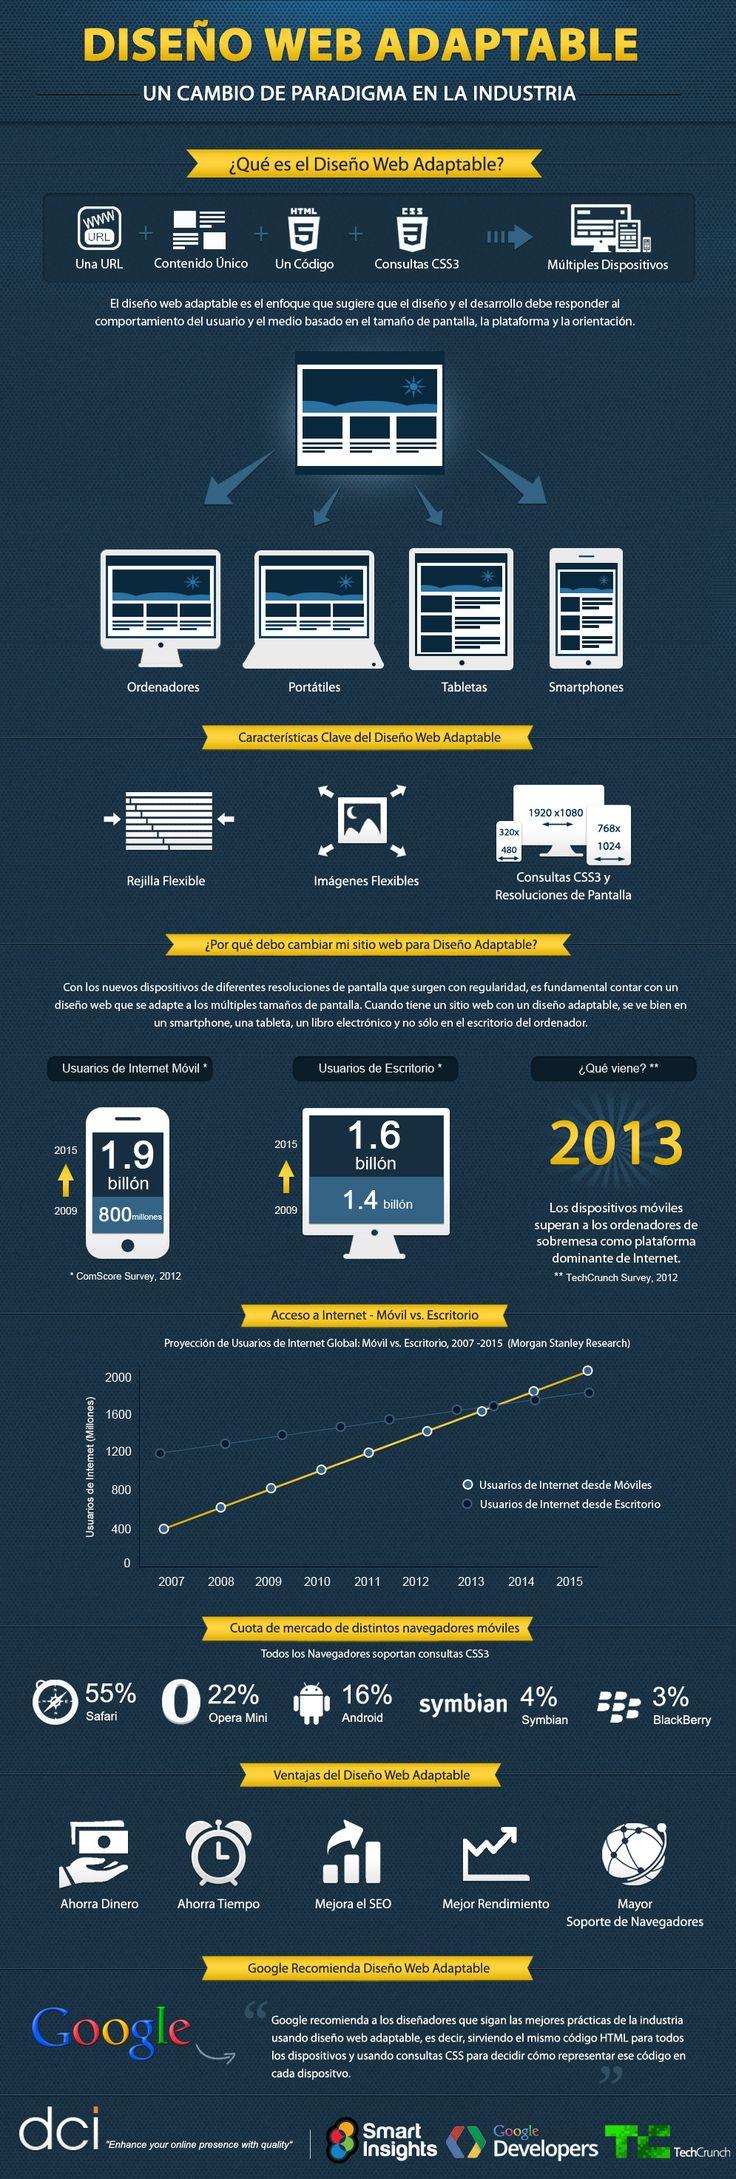 Diseño web adaptable / Responsive web design #infografia